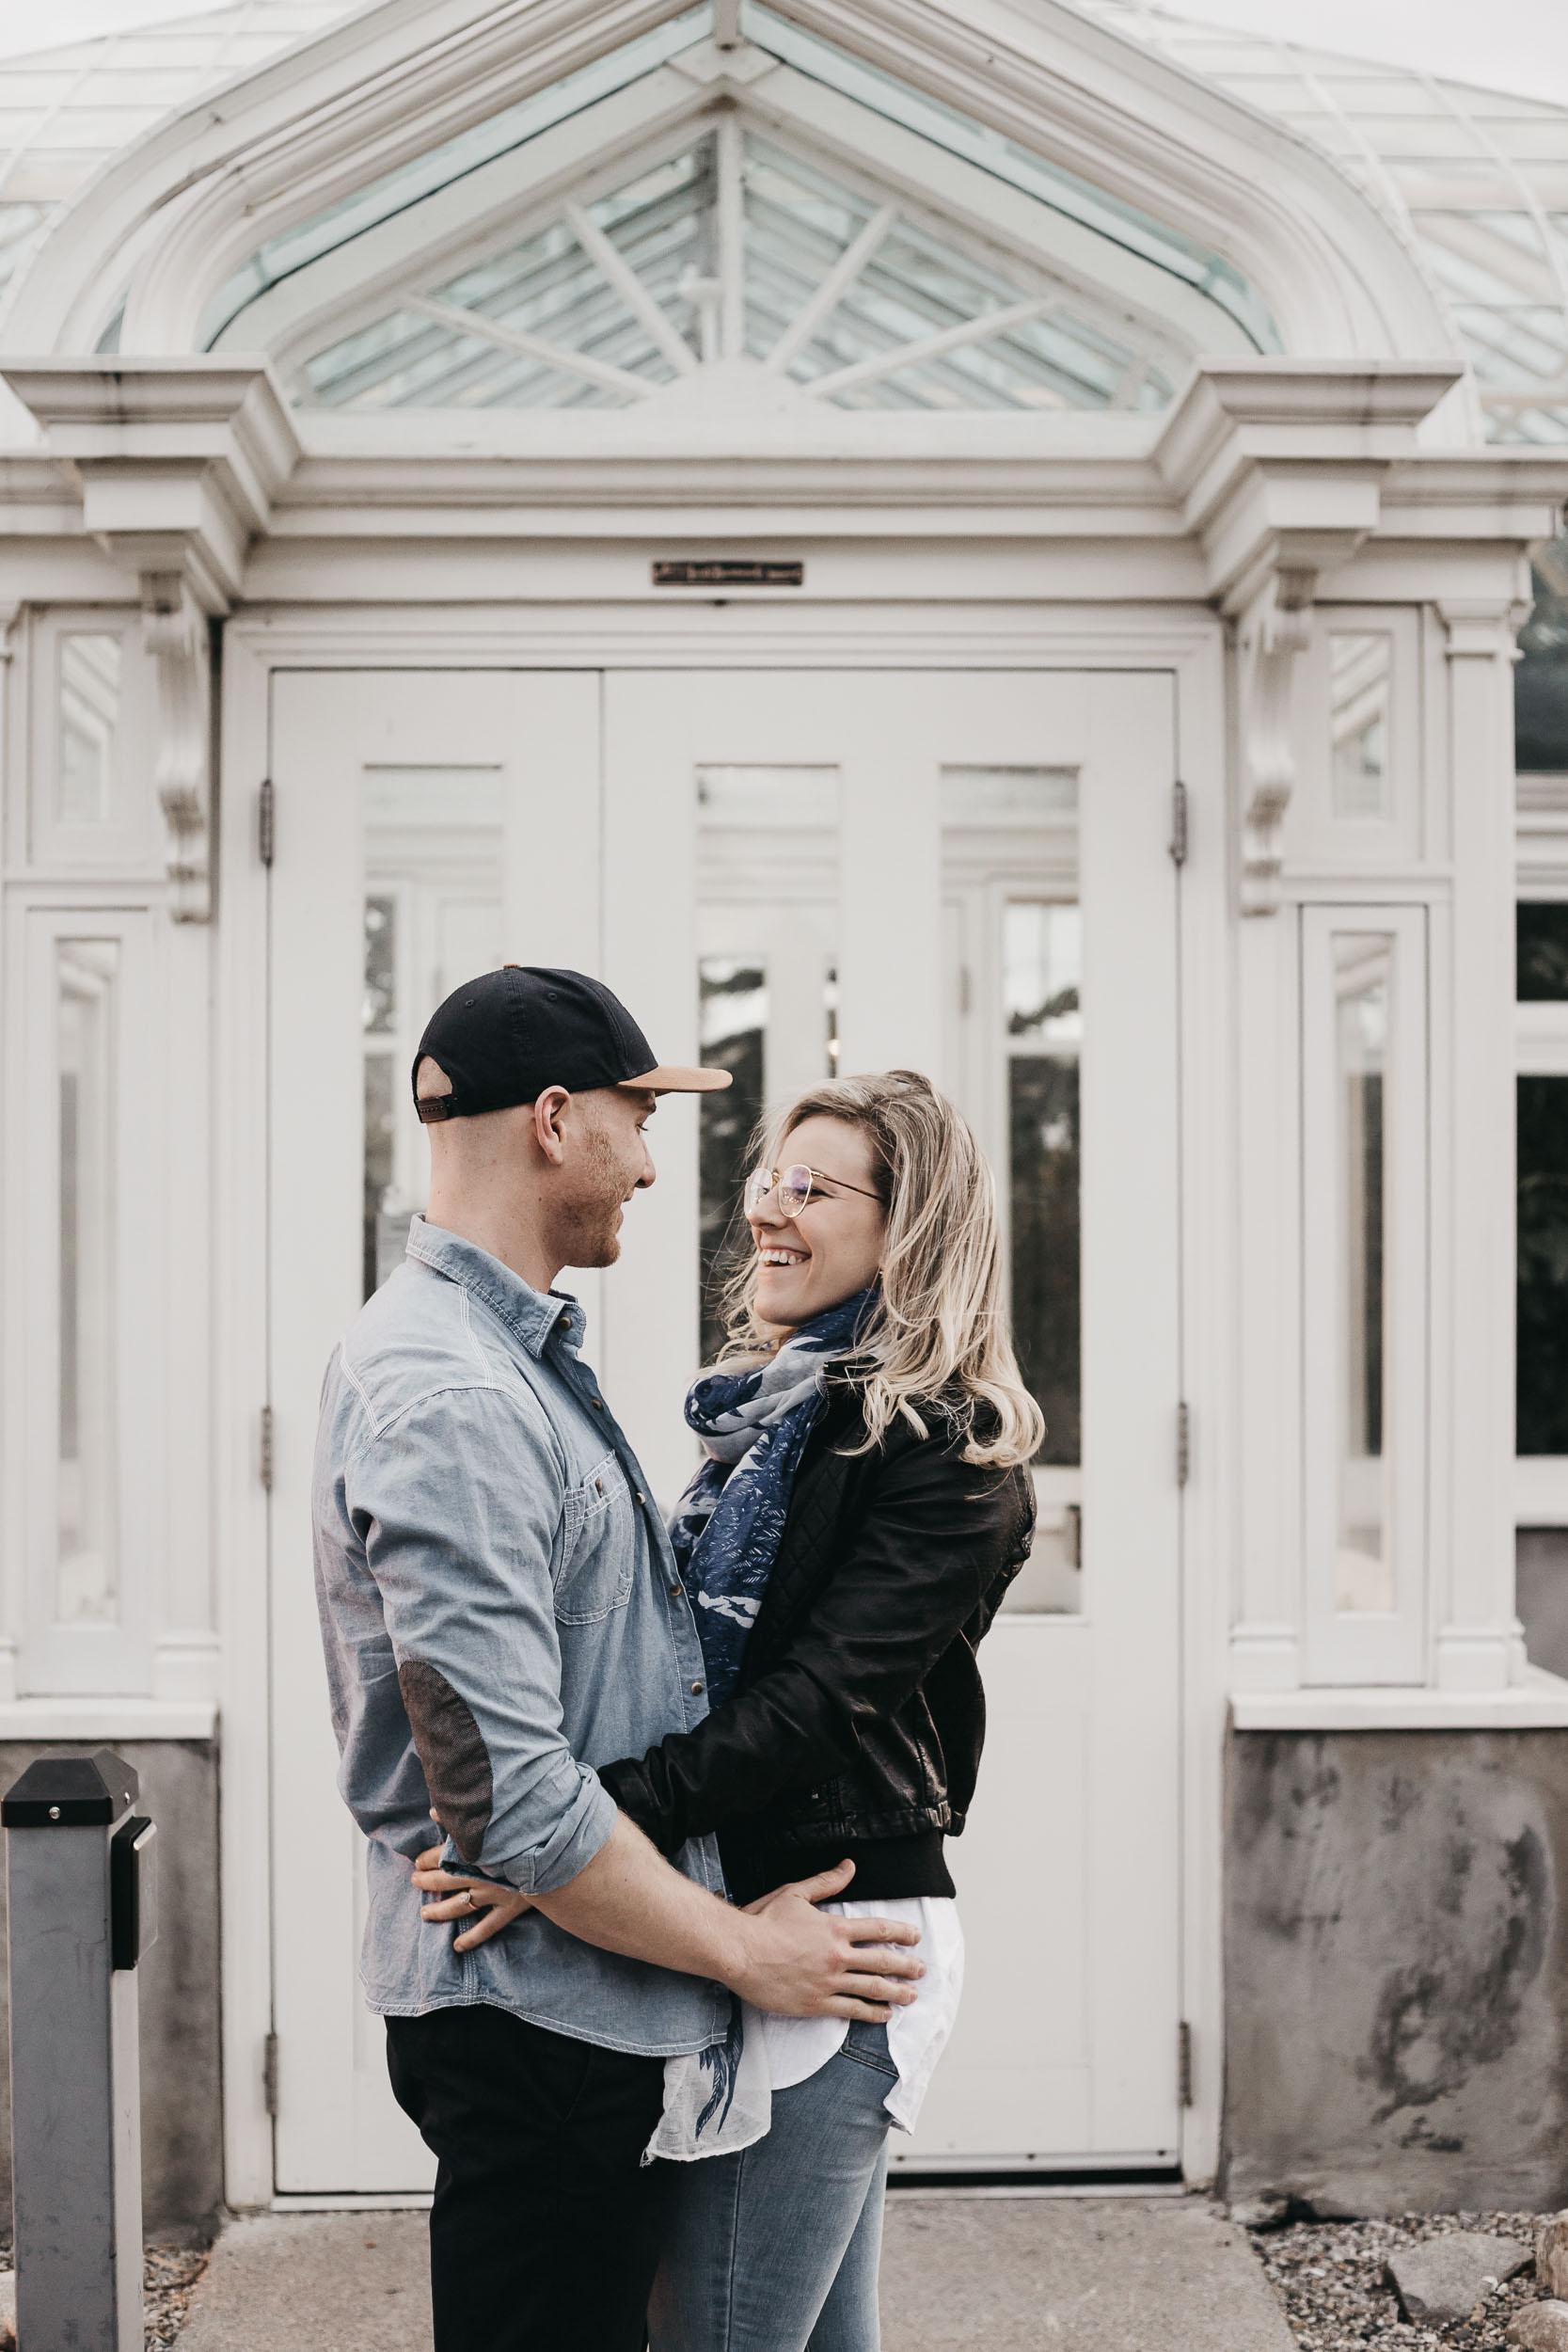 Ottawa-Elopement-Engagement-Photographer-7484.jpg